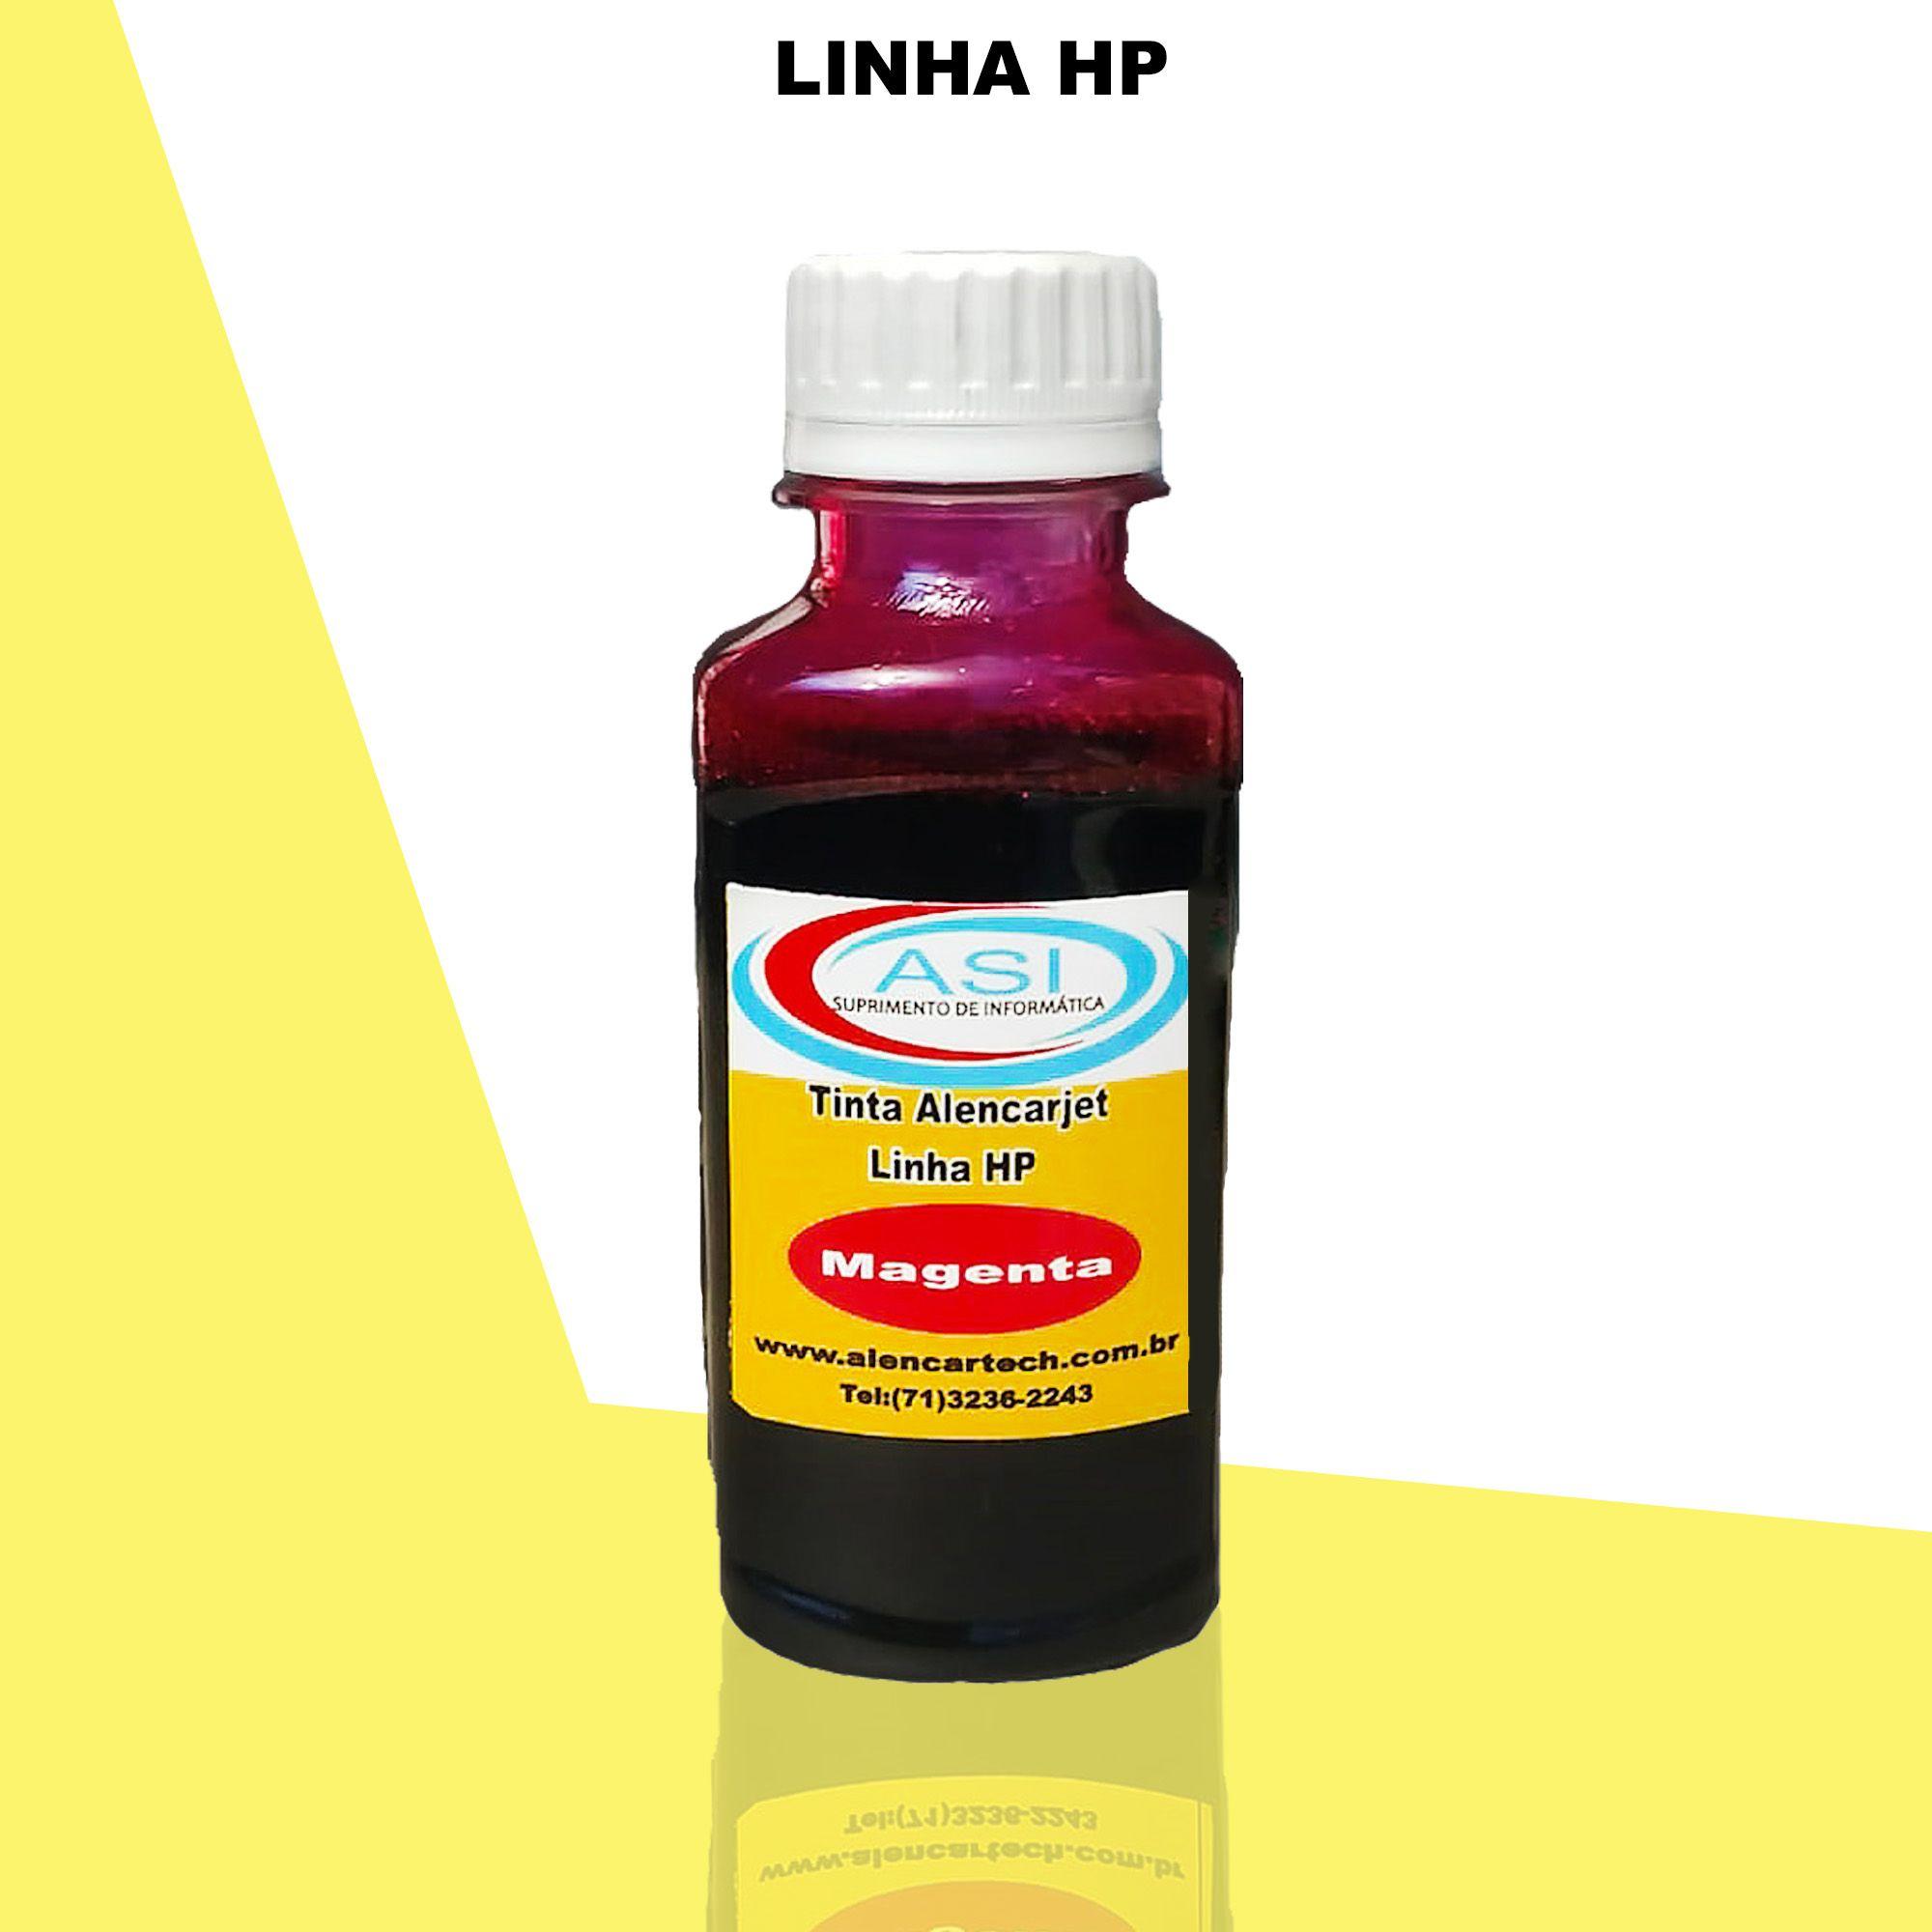 Tinta para HP ASI  Magenta 100ML/500ML/1LITRO